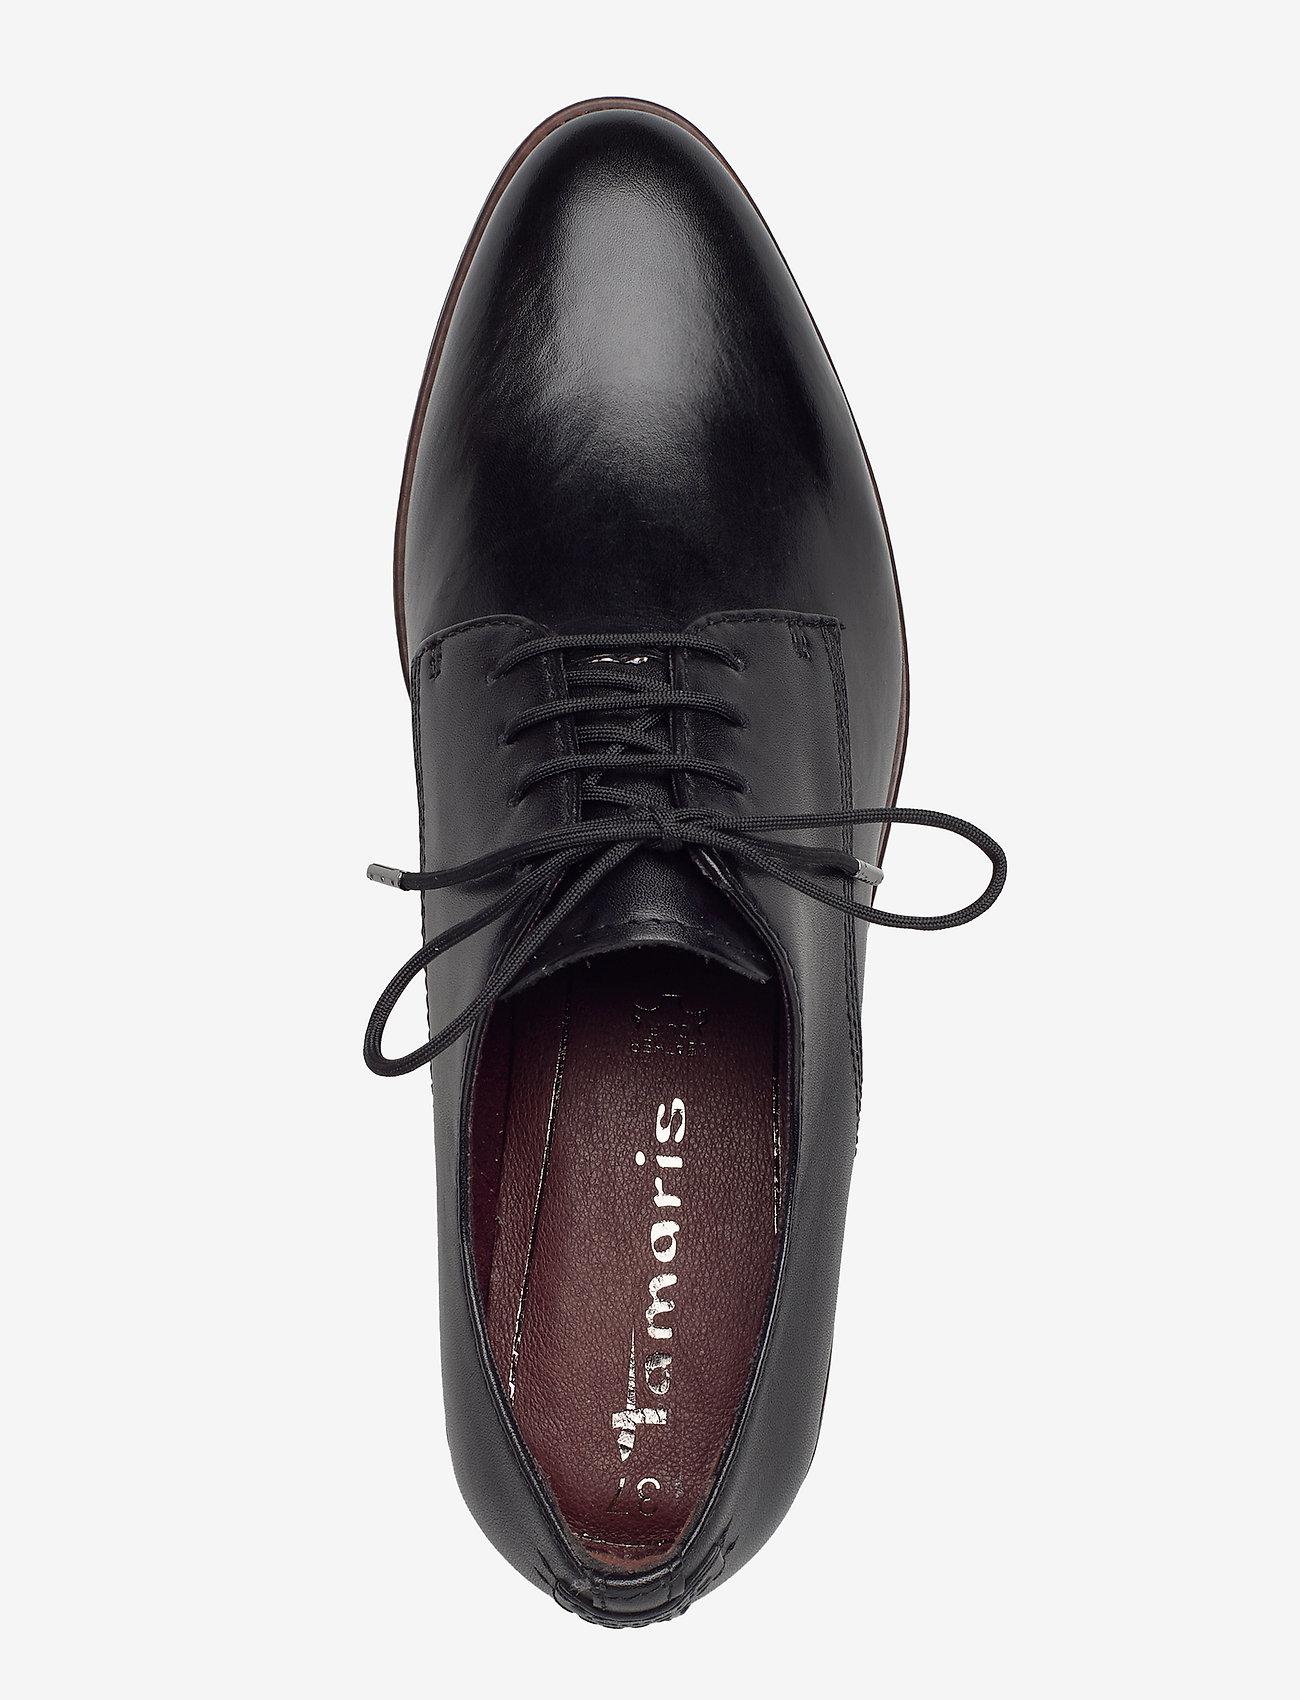 Woms Lace-up (Black Leather) (45.47 €) - Tamaris 3eBzN